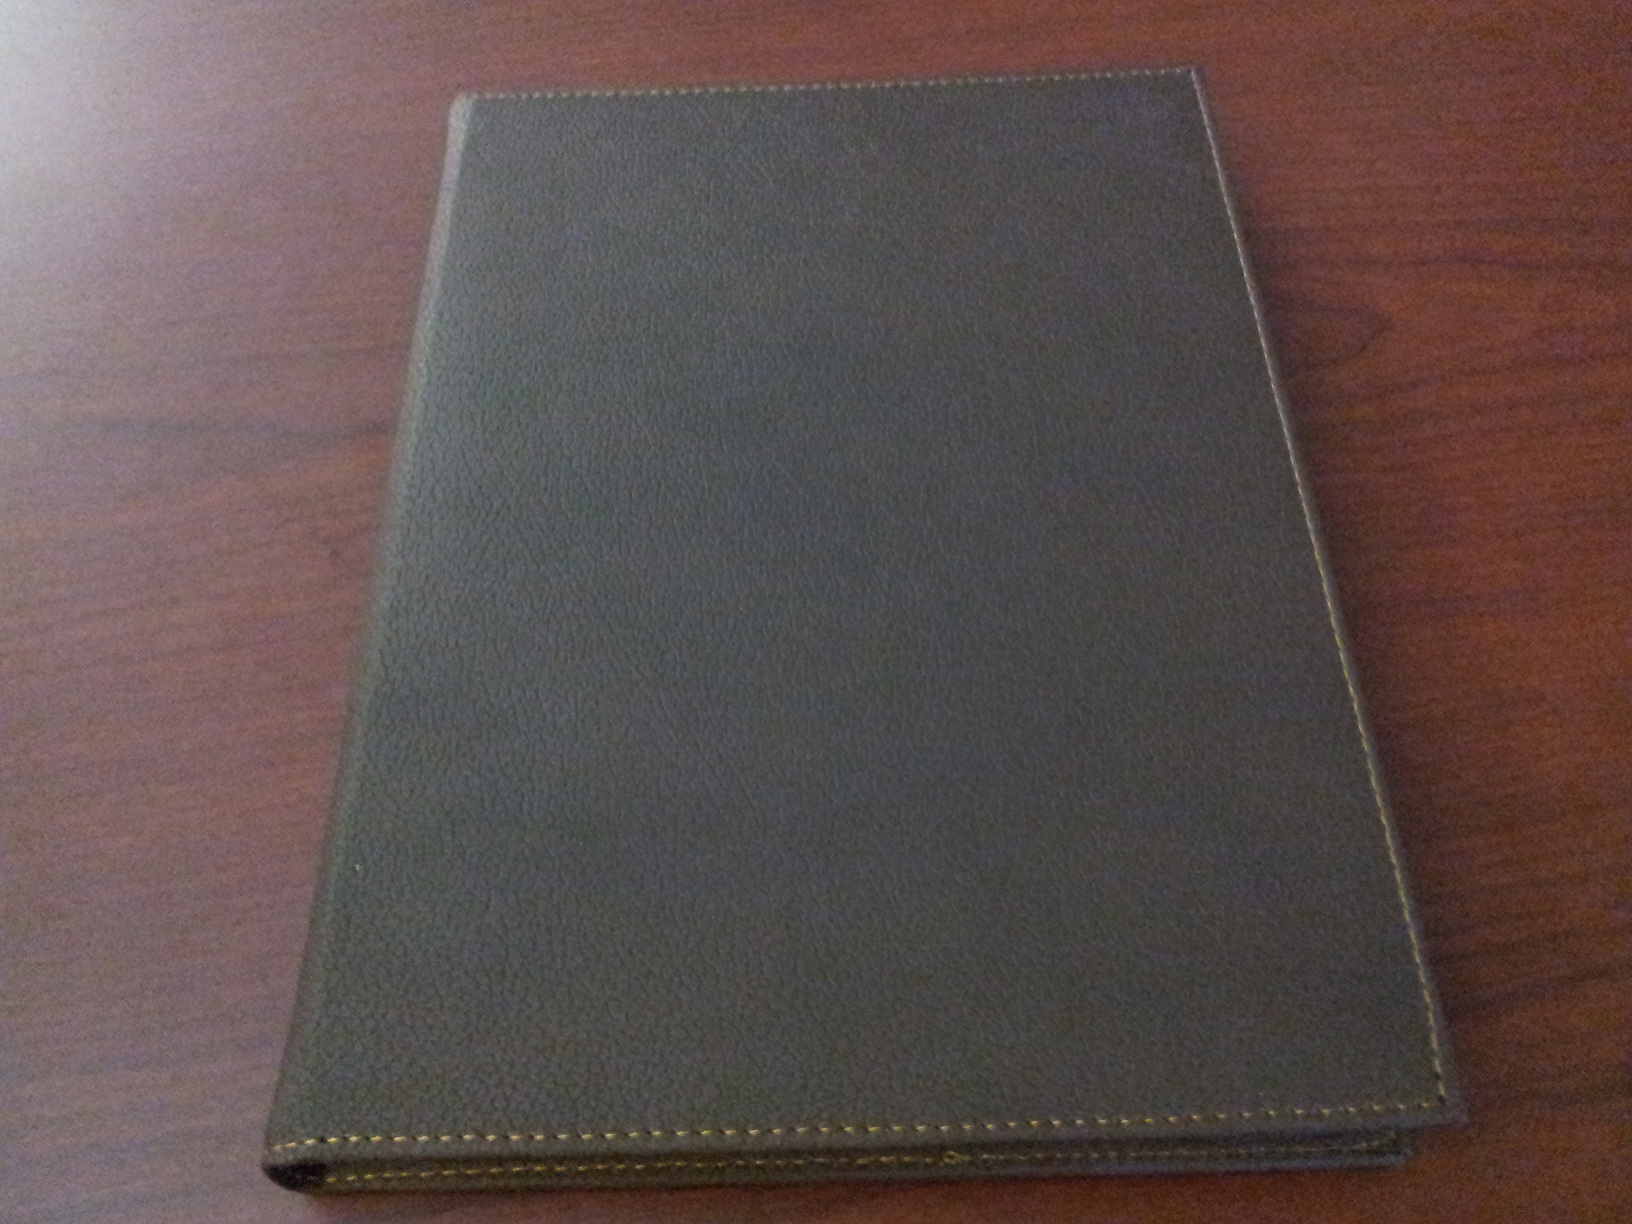 Winnable Executive Journal - Paper & Pen Paraphernalia Reviews and Articles - The Fountain Pen ...